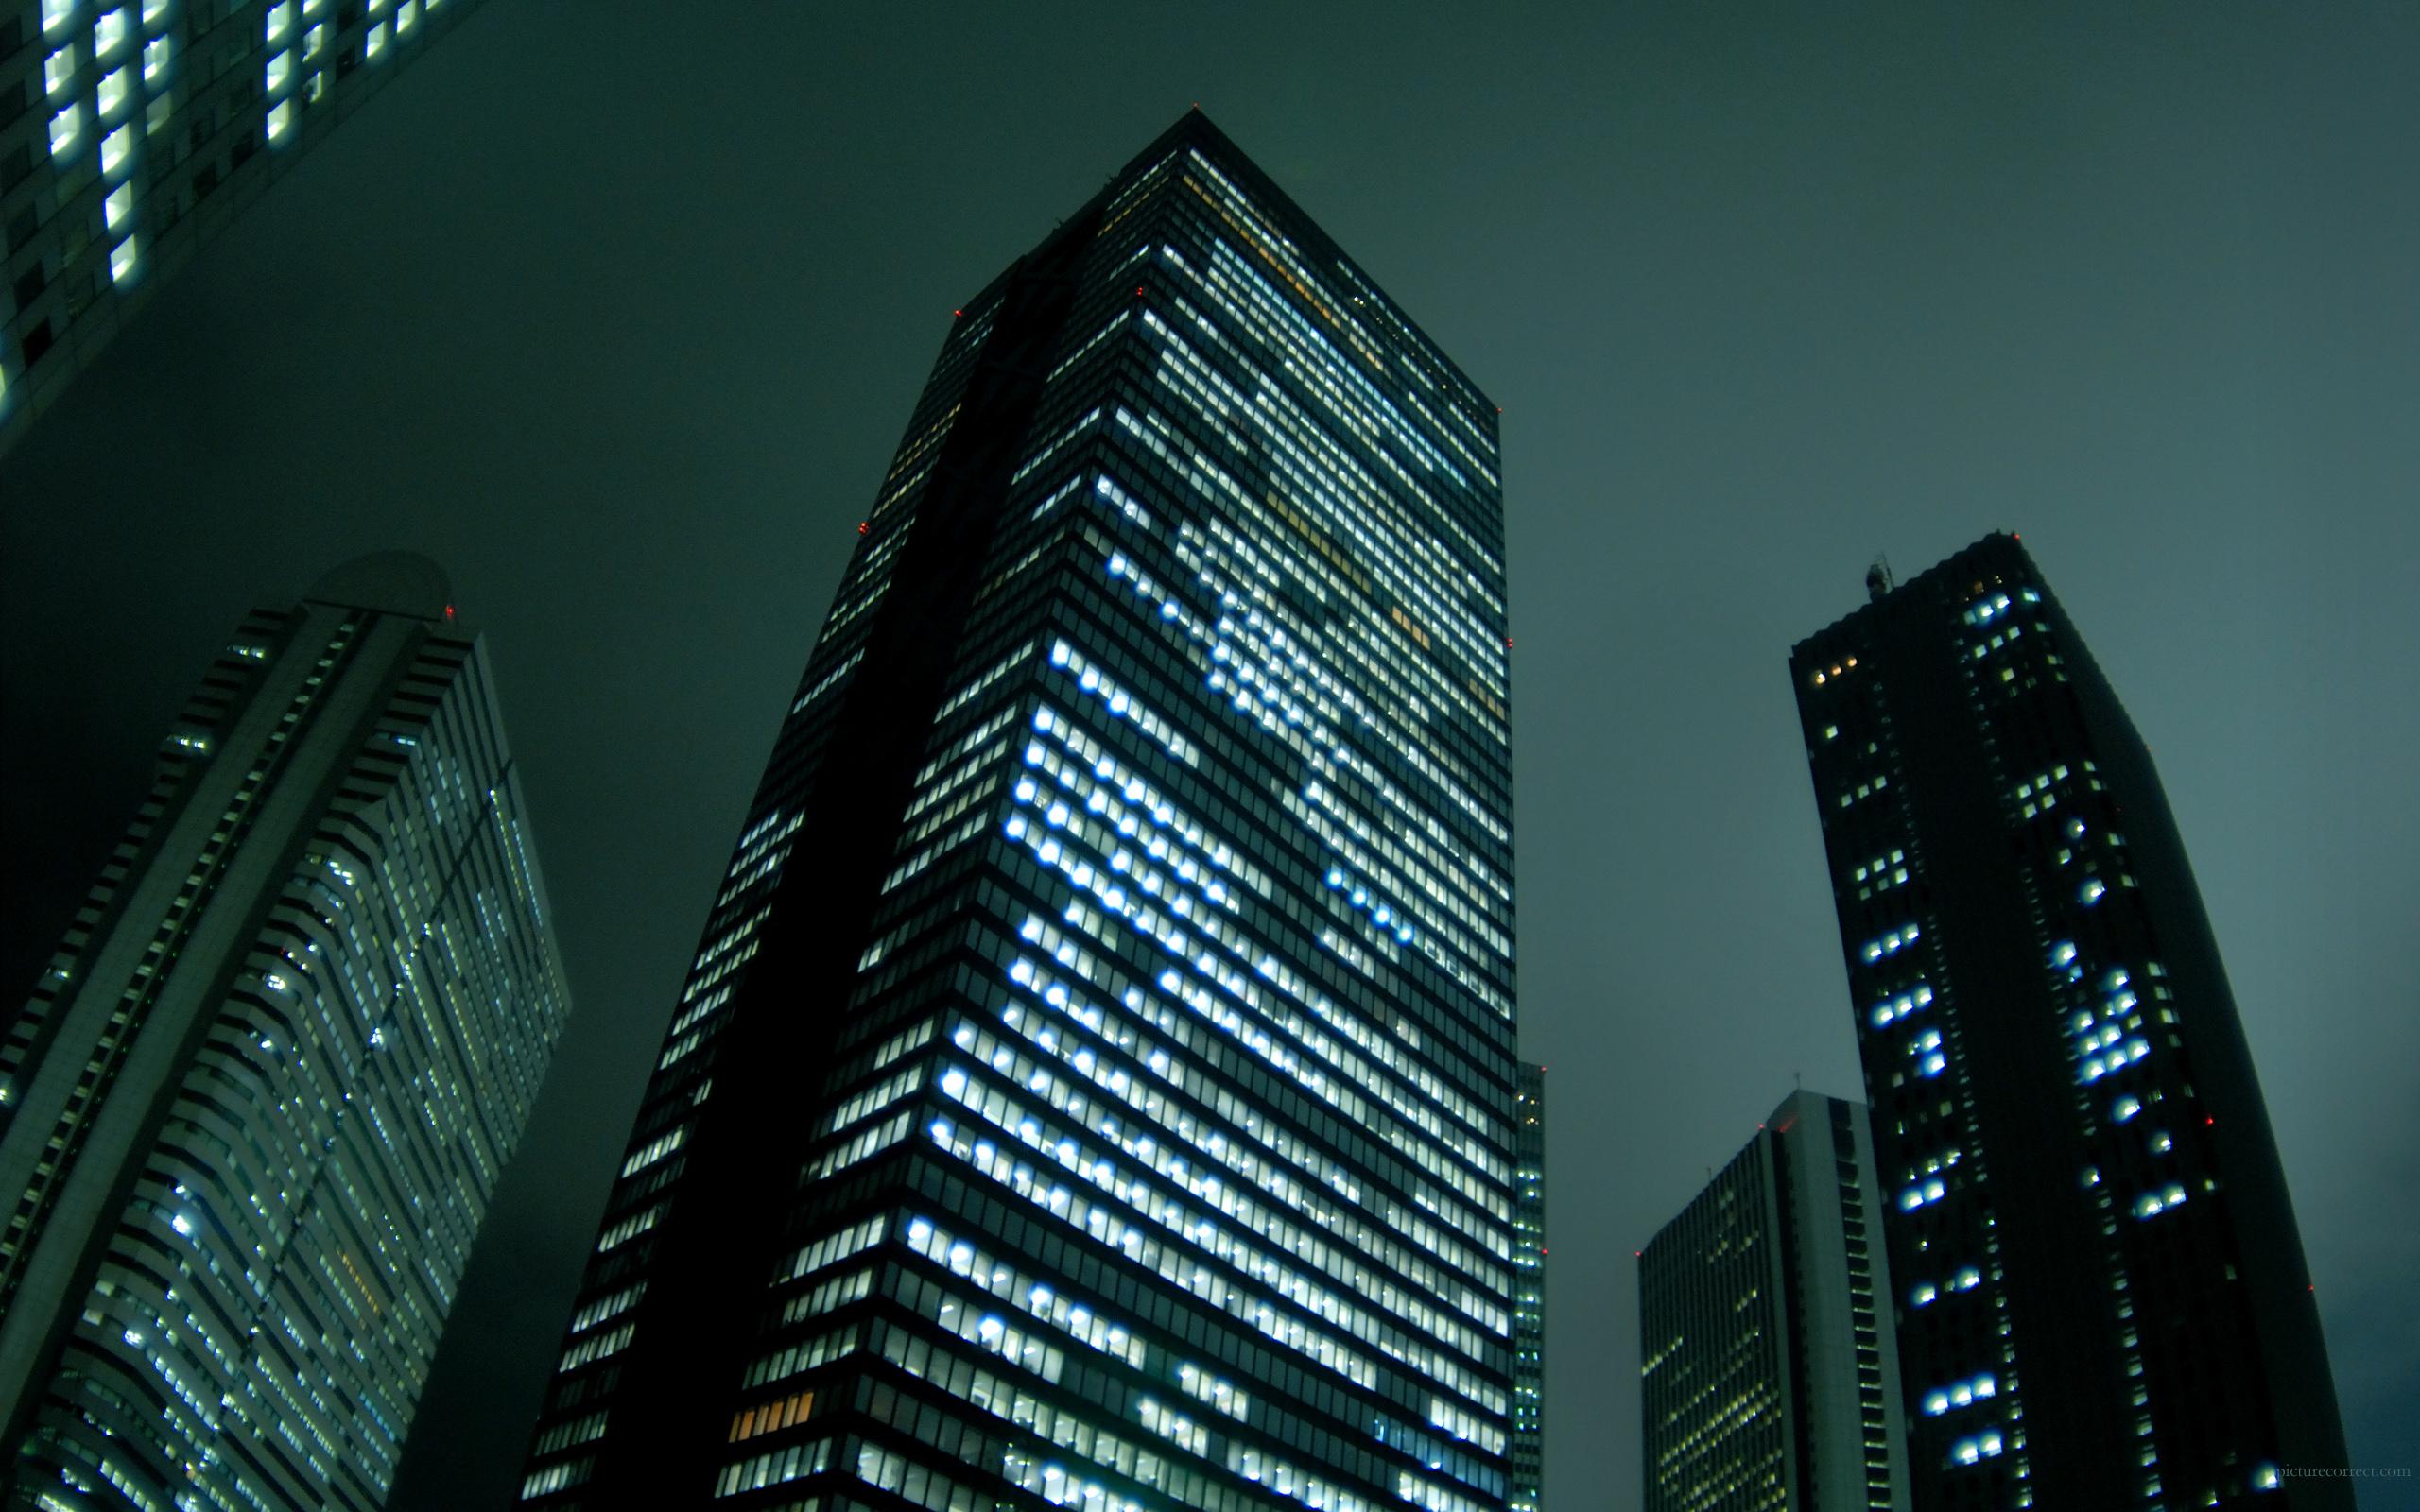 Dark Skyscrapers | Cool Wallpapers